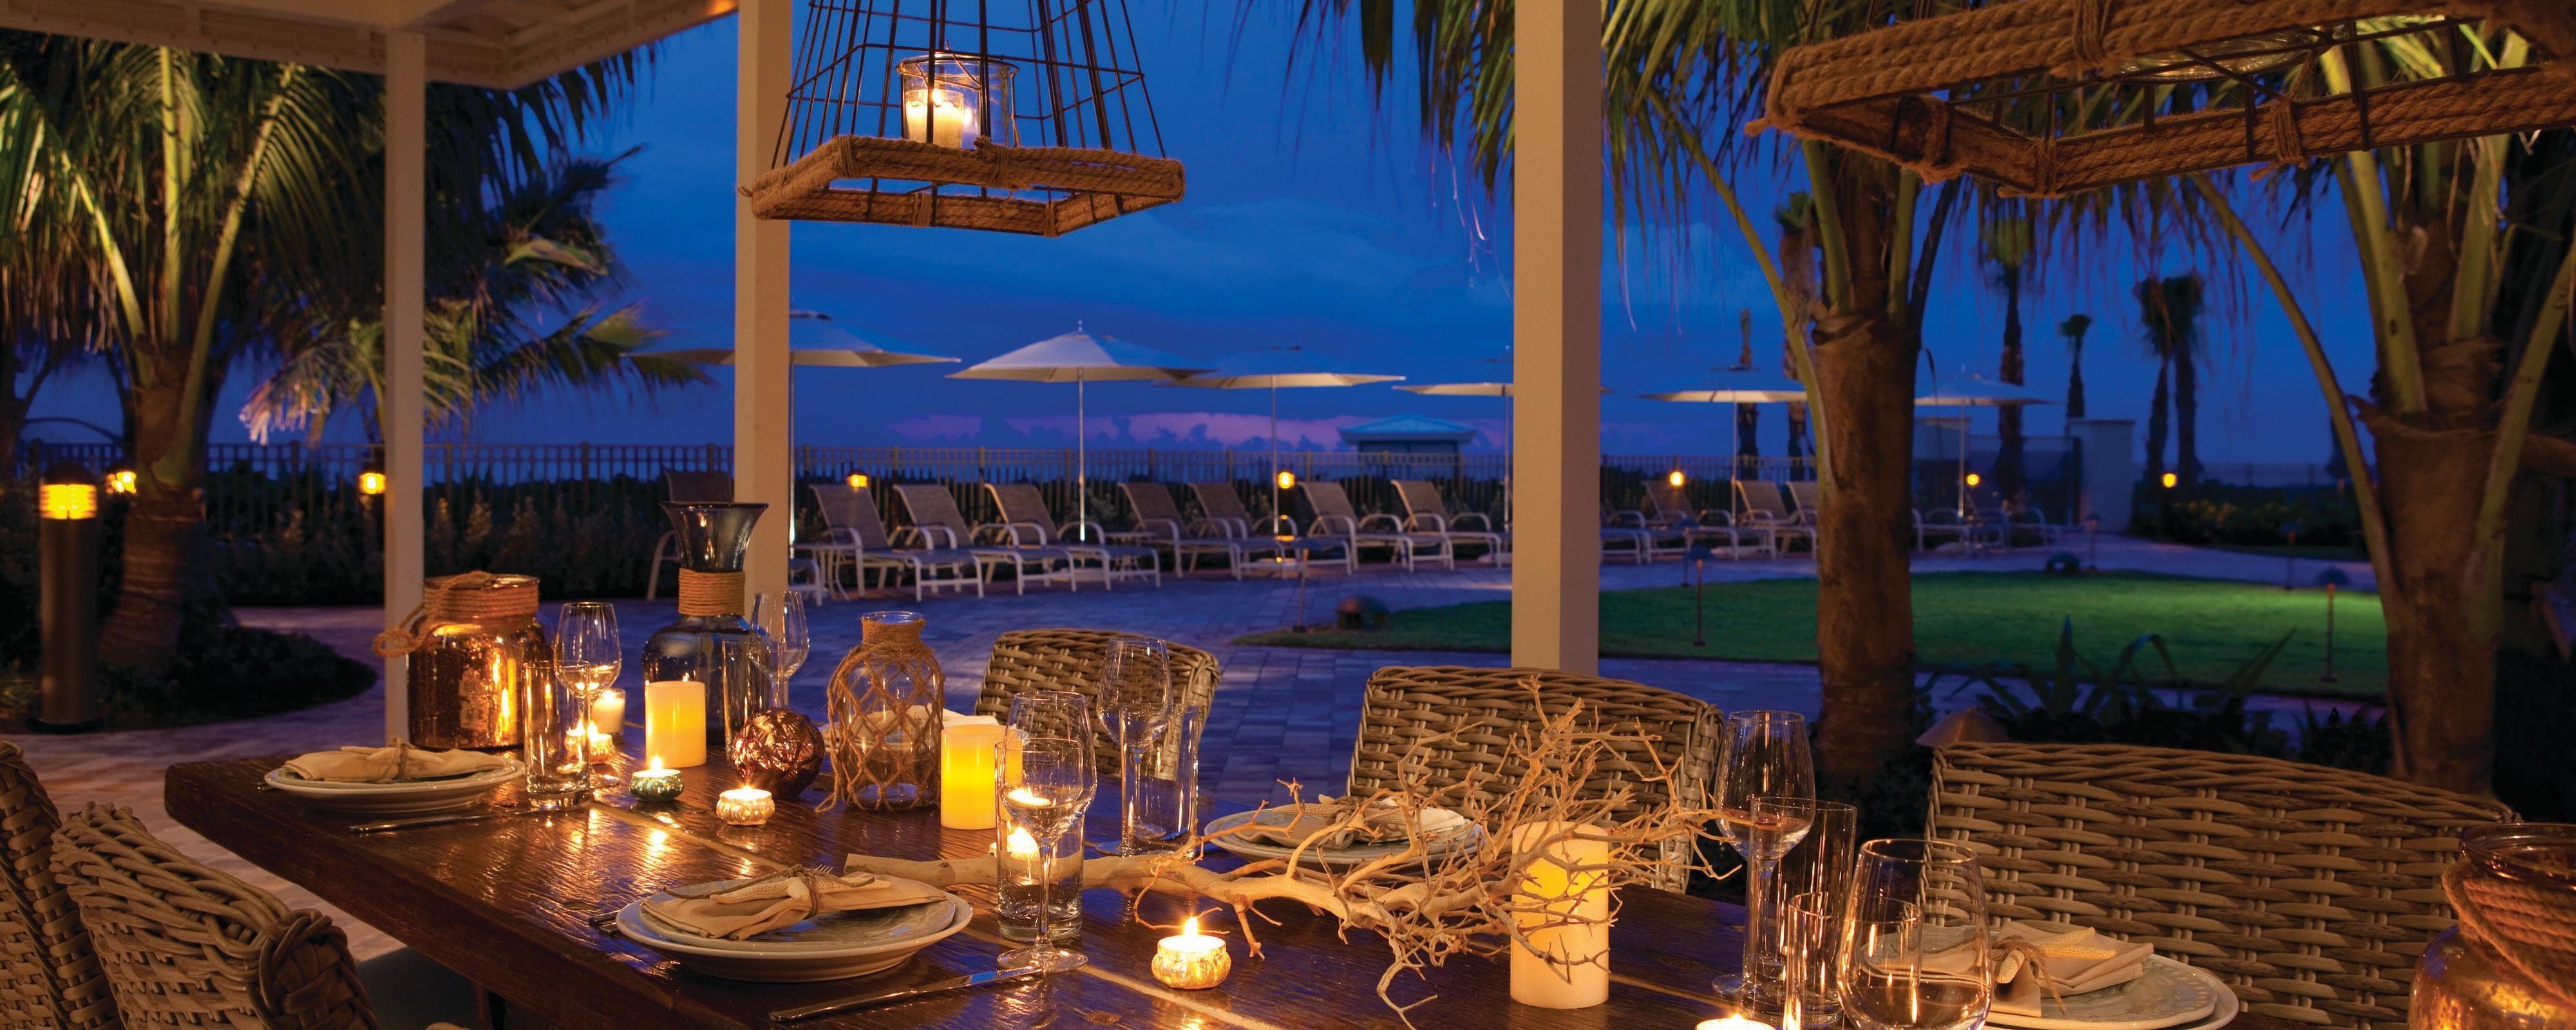 Fresh Beauty Fort Lauderdale